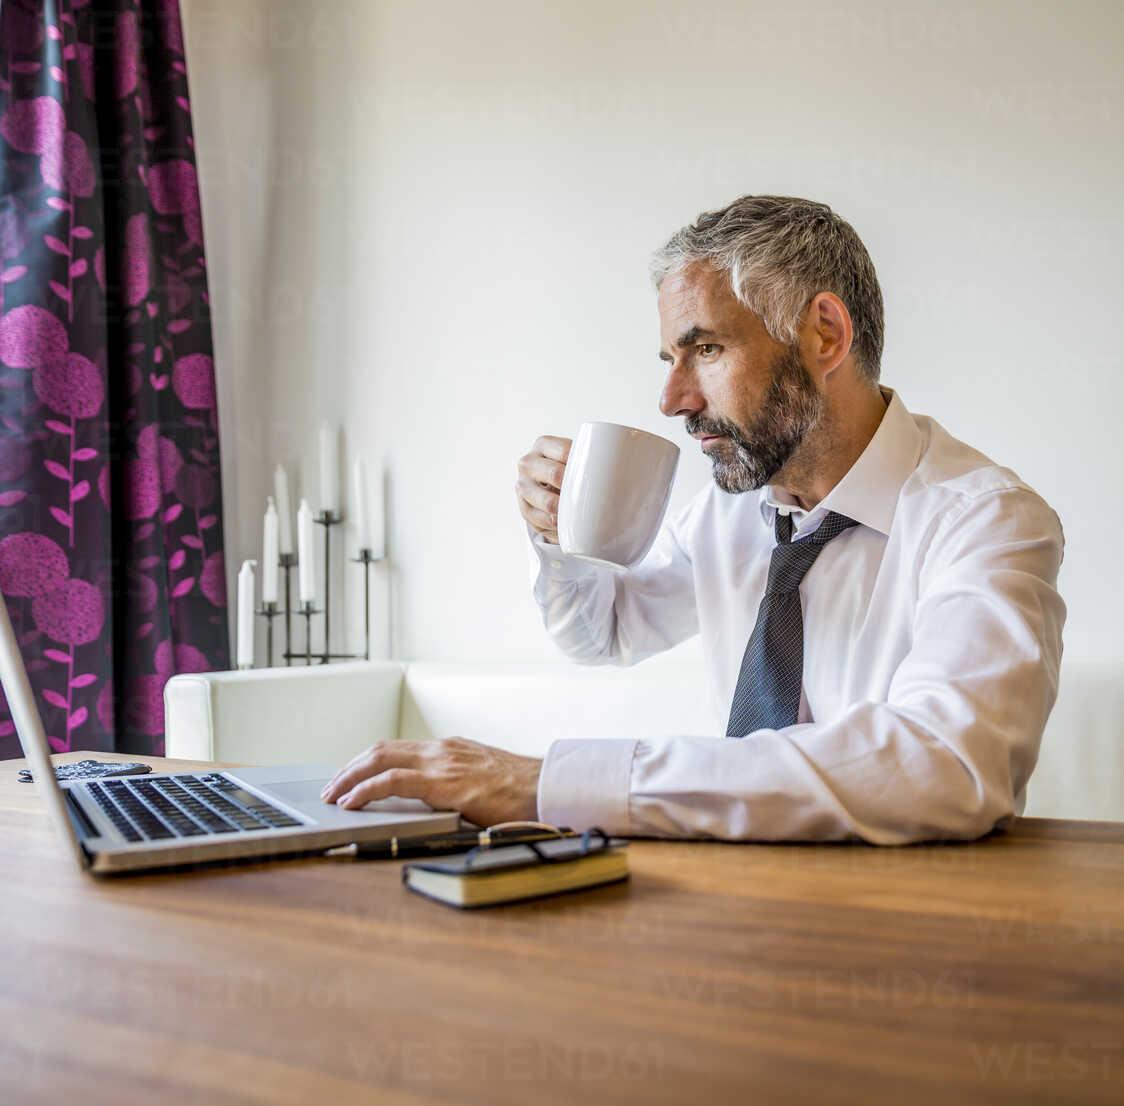 Portrait of businessman working at home office drinking coffee - MBEF001232 - Martin Benik/Westend61